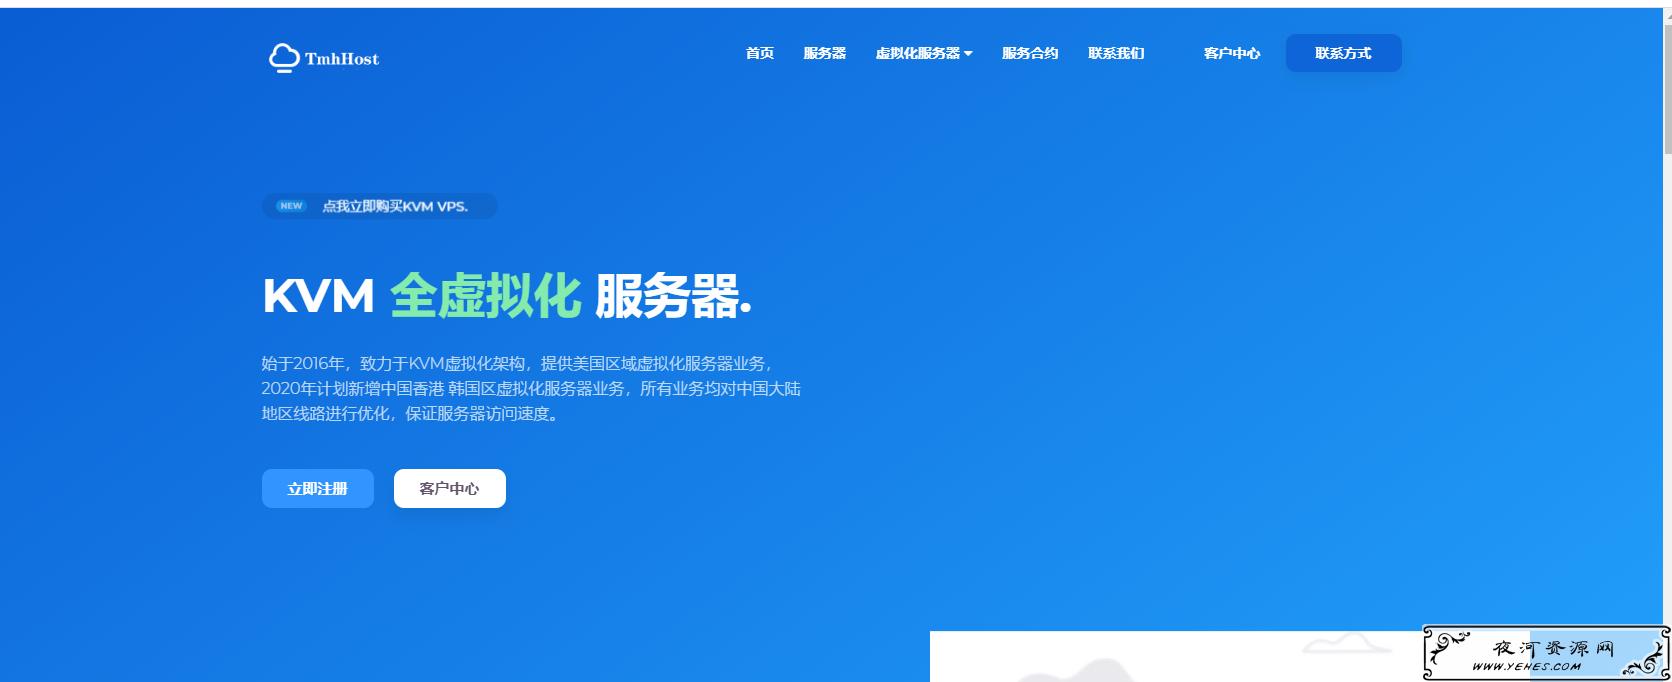 TmhHost黄金周充值返10%活动,日本软银/韩国CN2/洛杉矶安畅GIA高质量线路33元/月起,100M带宽香港ntt新品上线